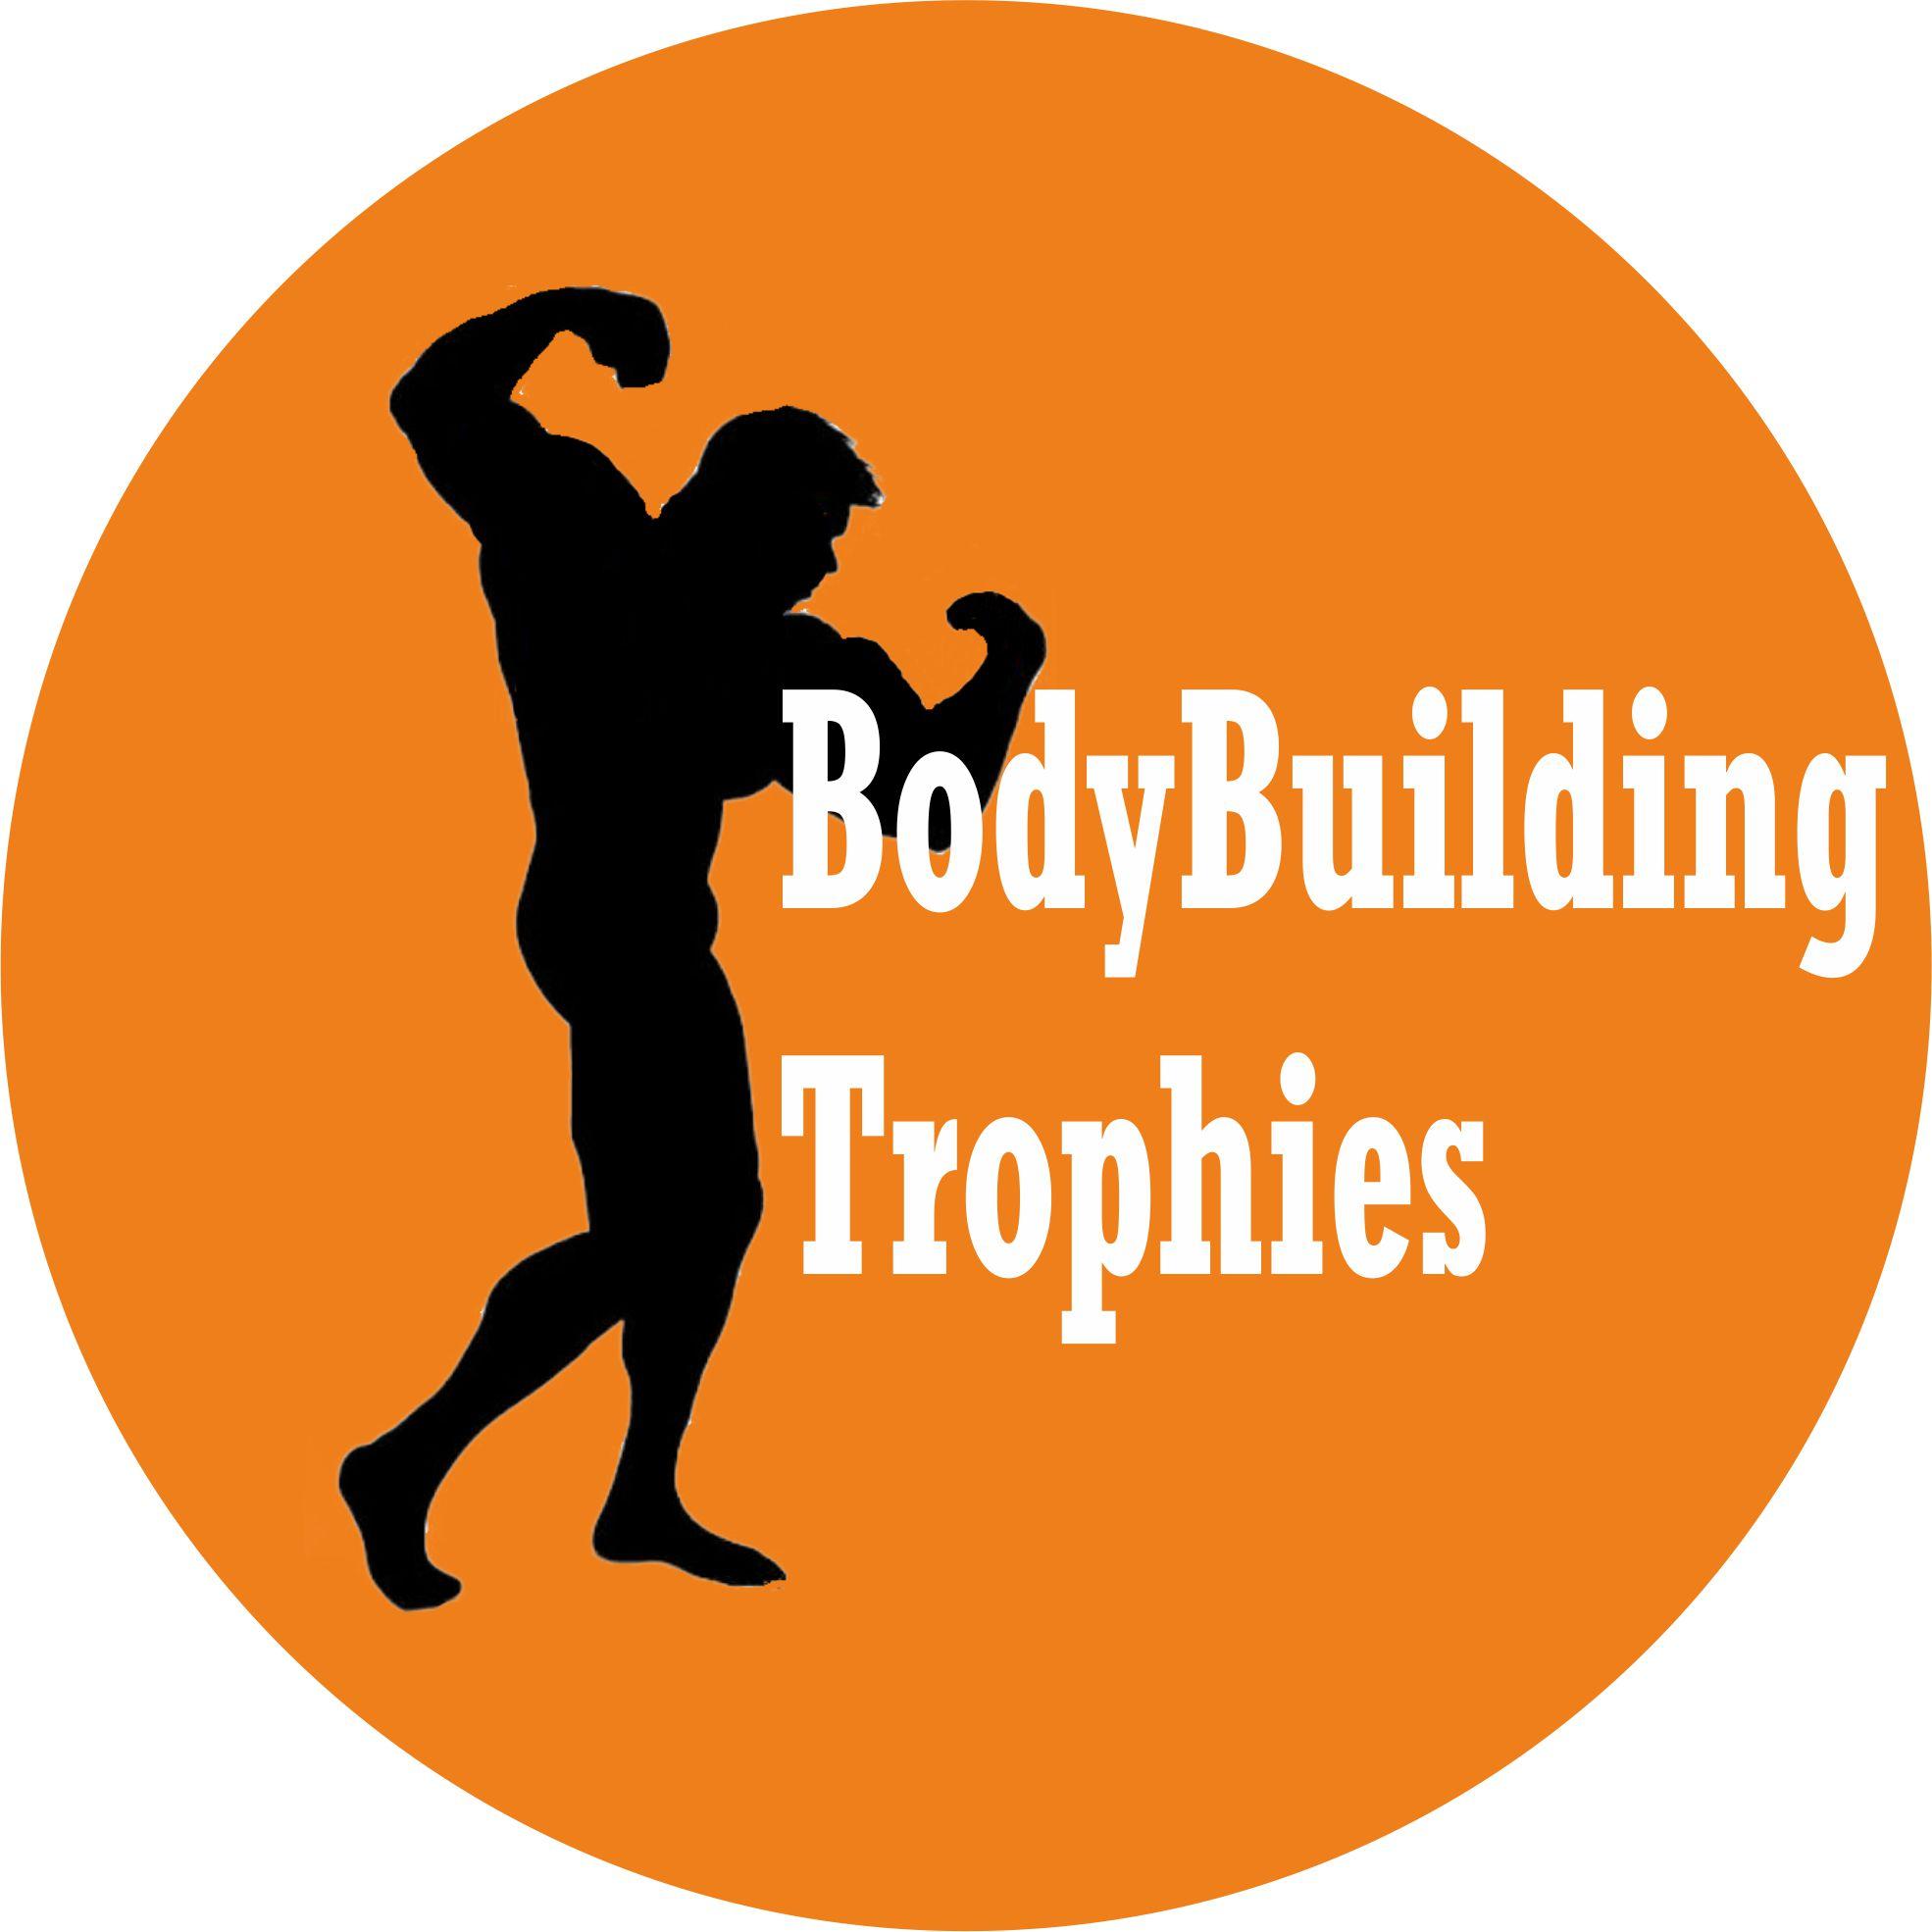 Body Building Trophies